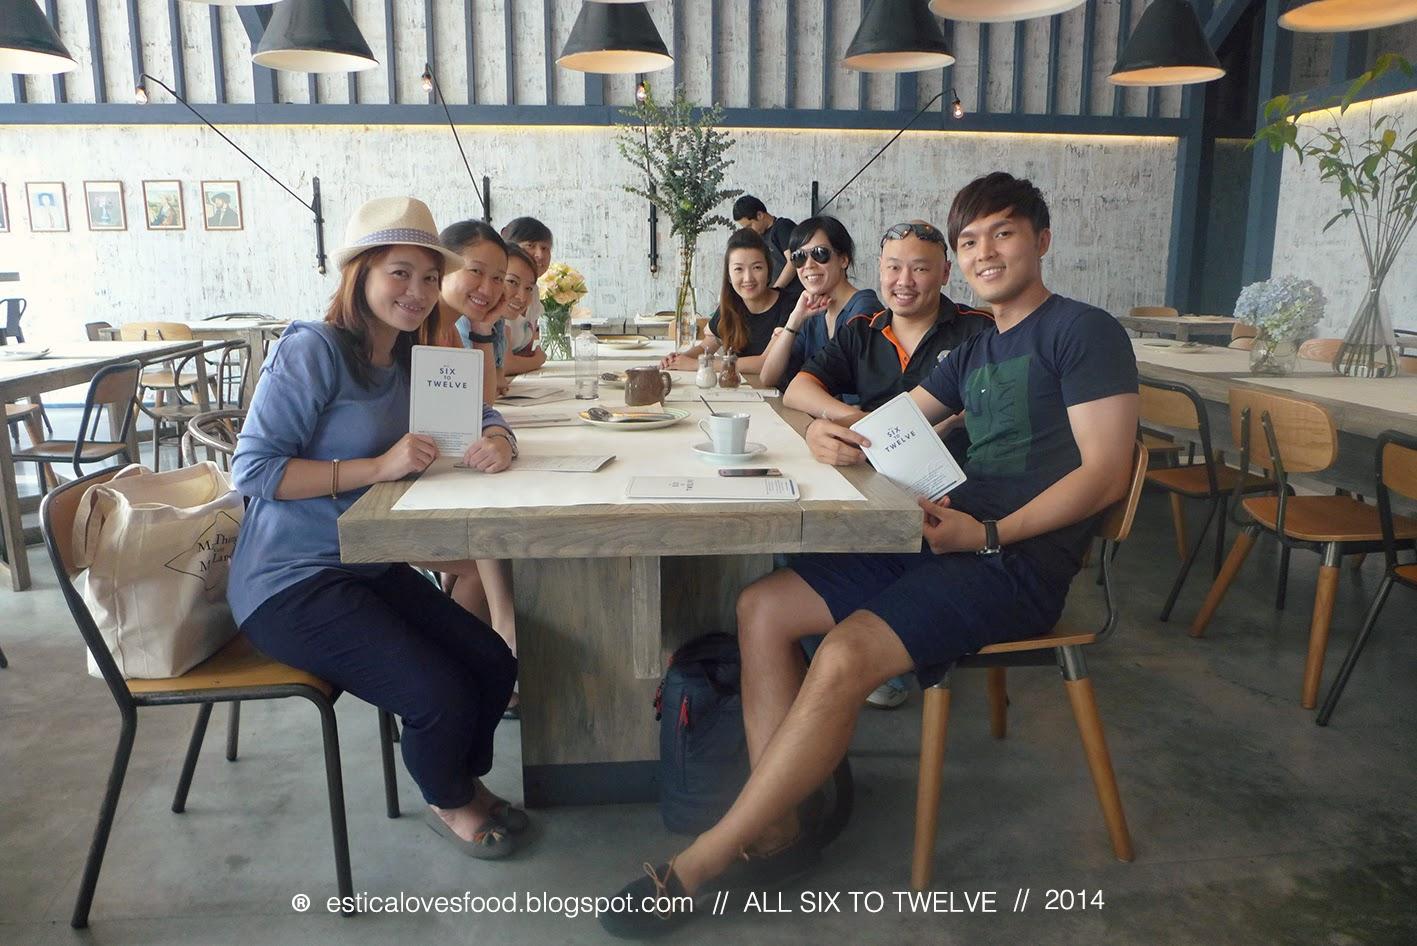 BANGKOK . ALL SIX TO TWELVE 曼谷 . 全天18小時營業的優質食堂 (完全符合我心目中平、靚、正的條件!)